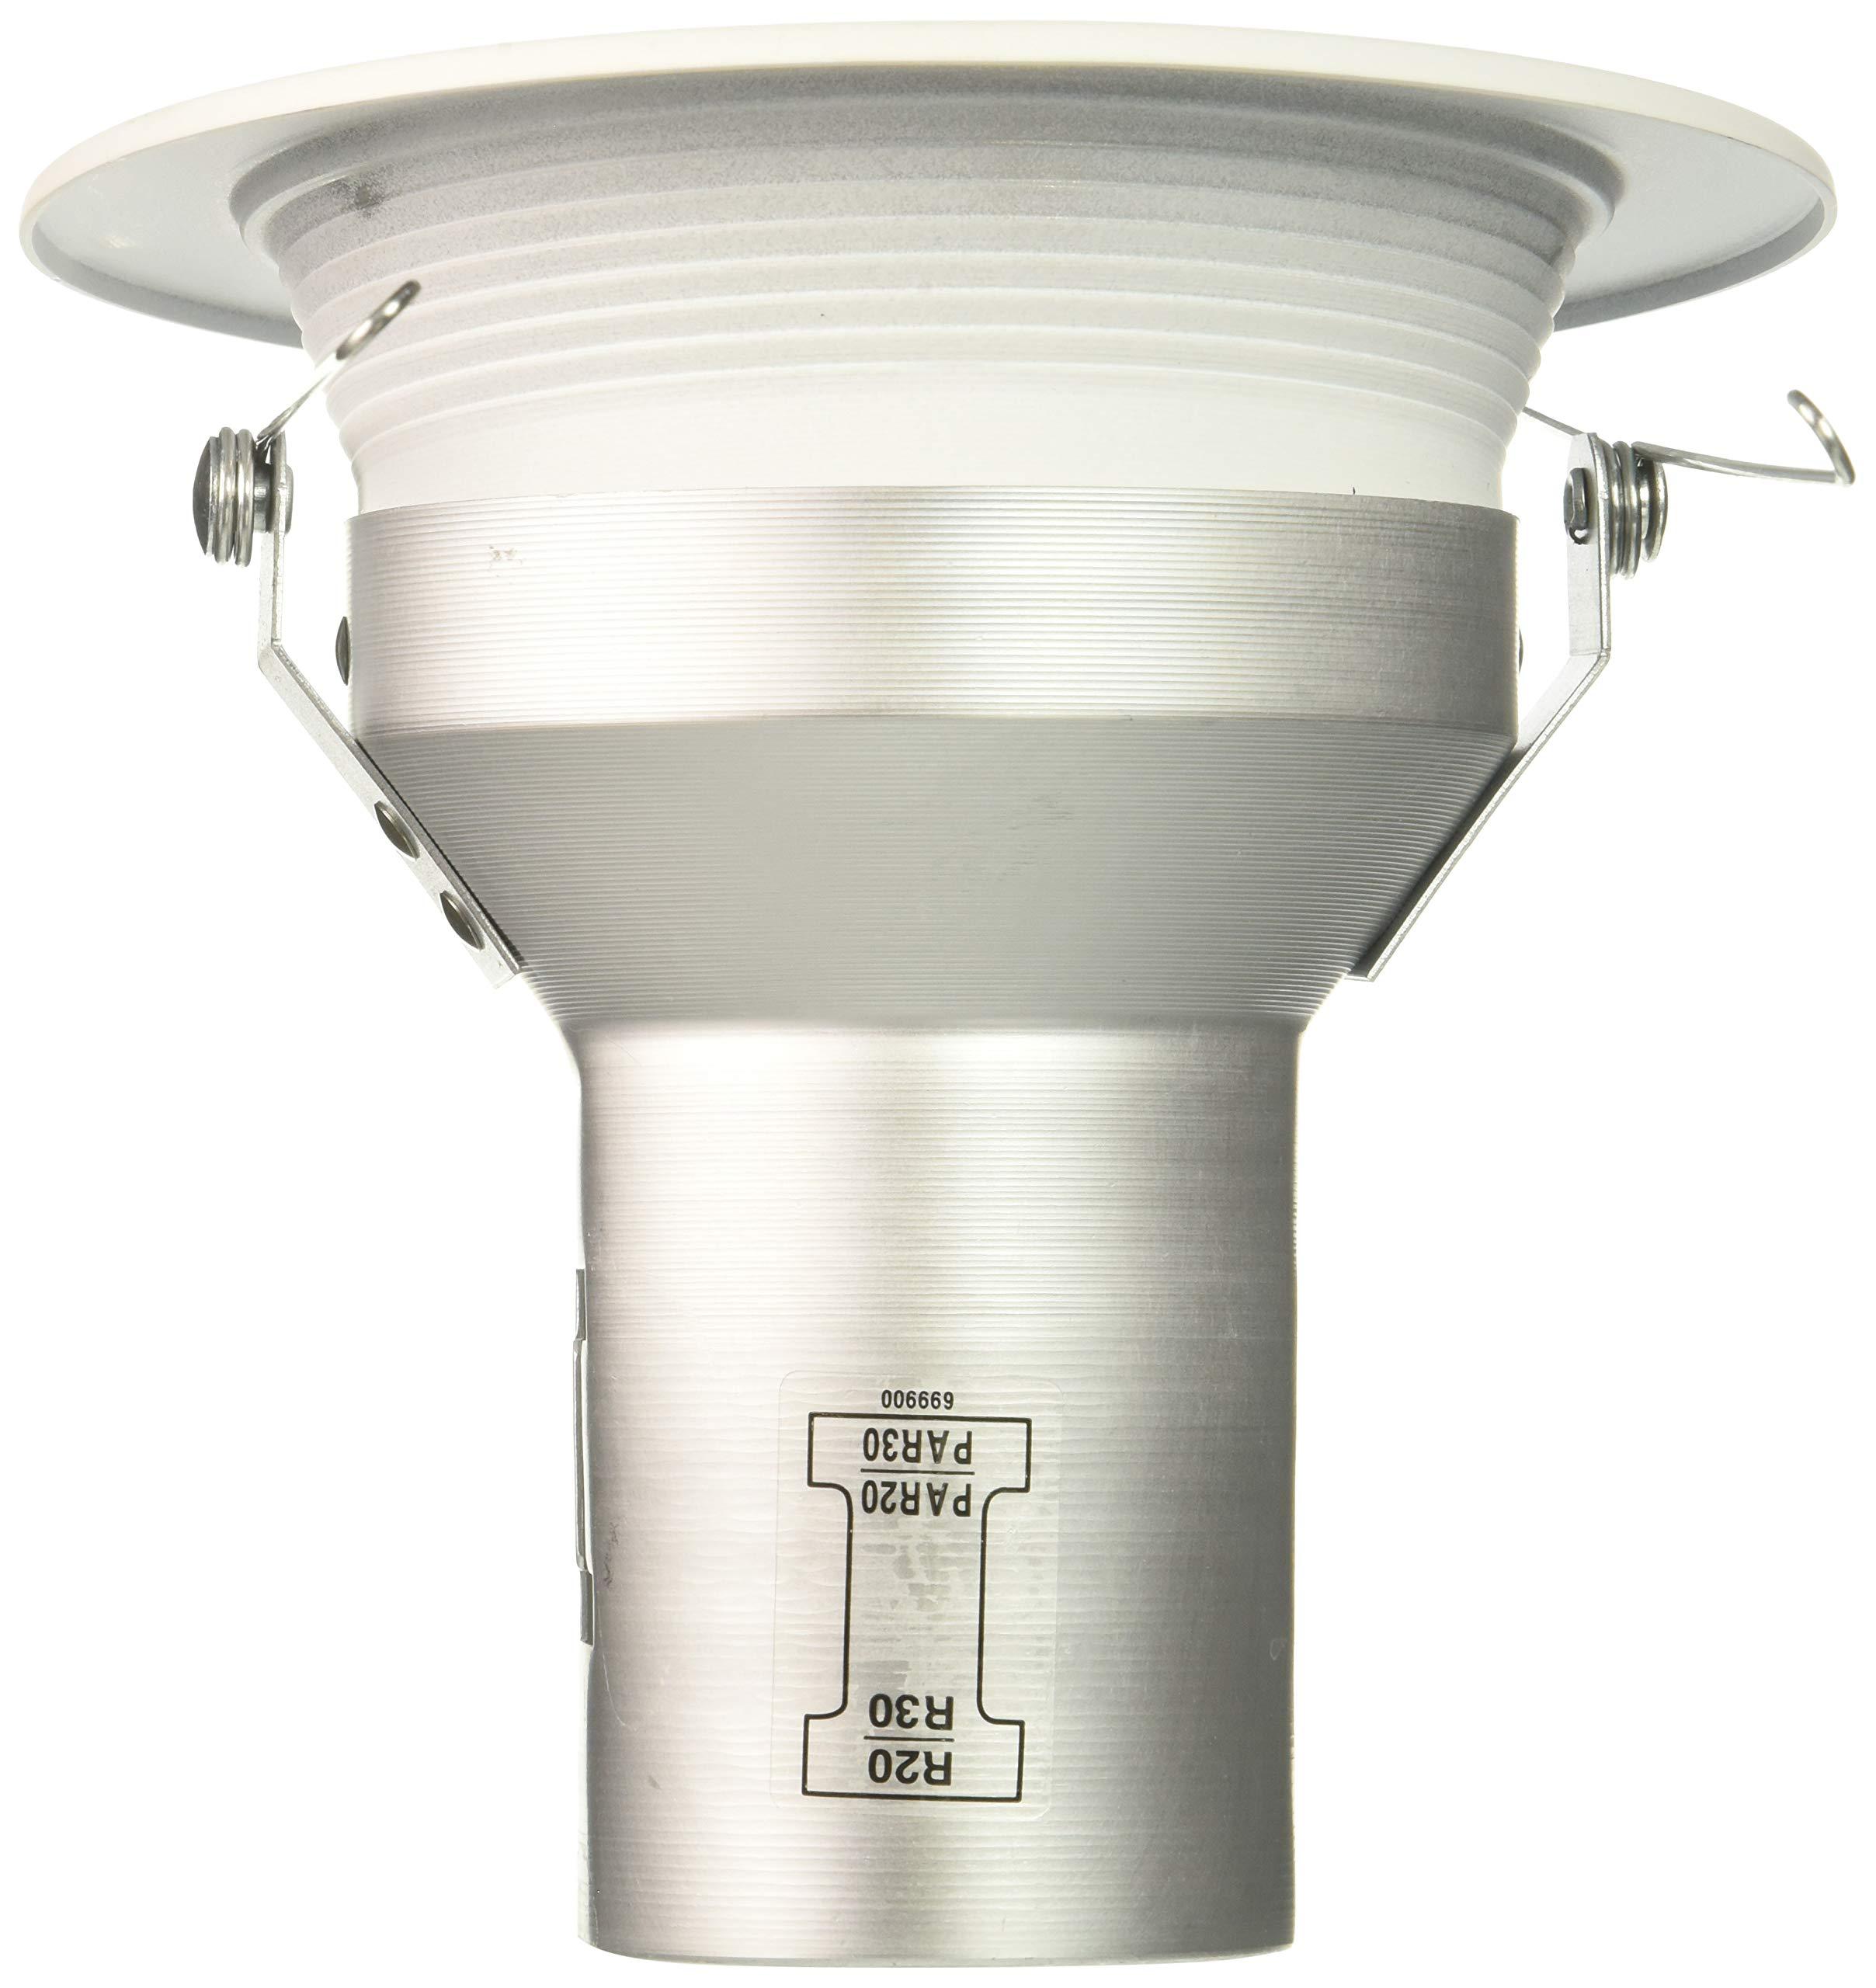 HALO Recessed 5001P-6PK Trim Baffle White Trim with White Baffle, 5''